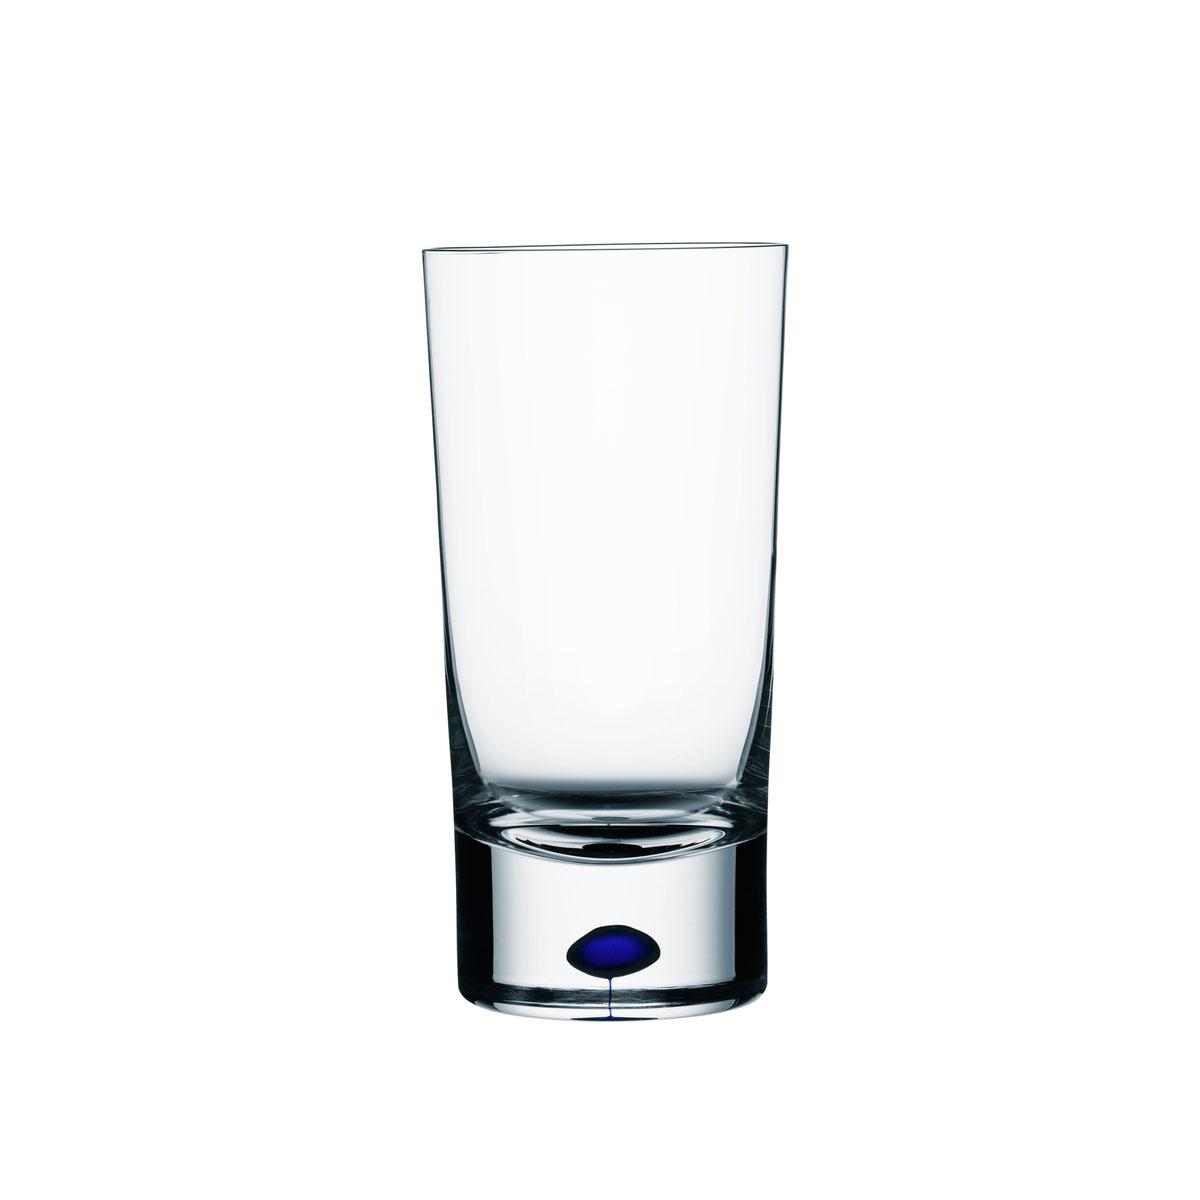 Orrefors Crystal, Intermezzo Blue Tumbler, Single